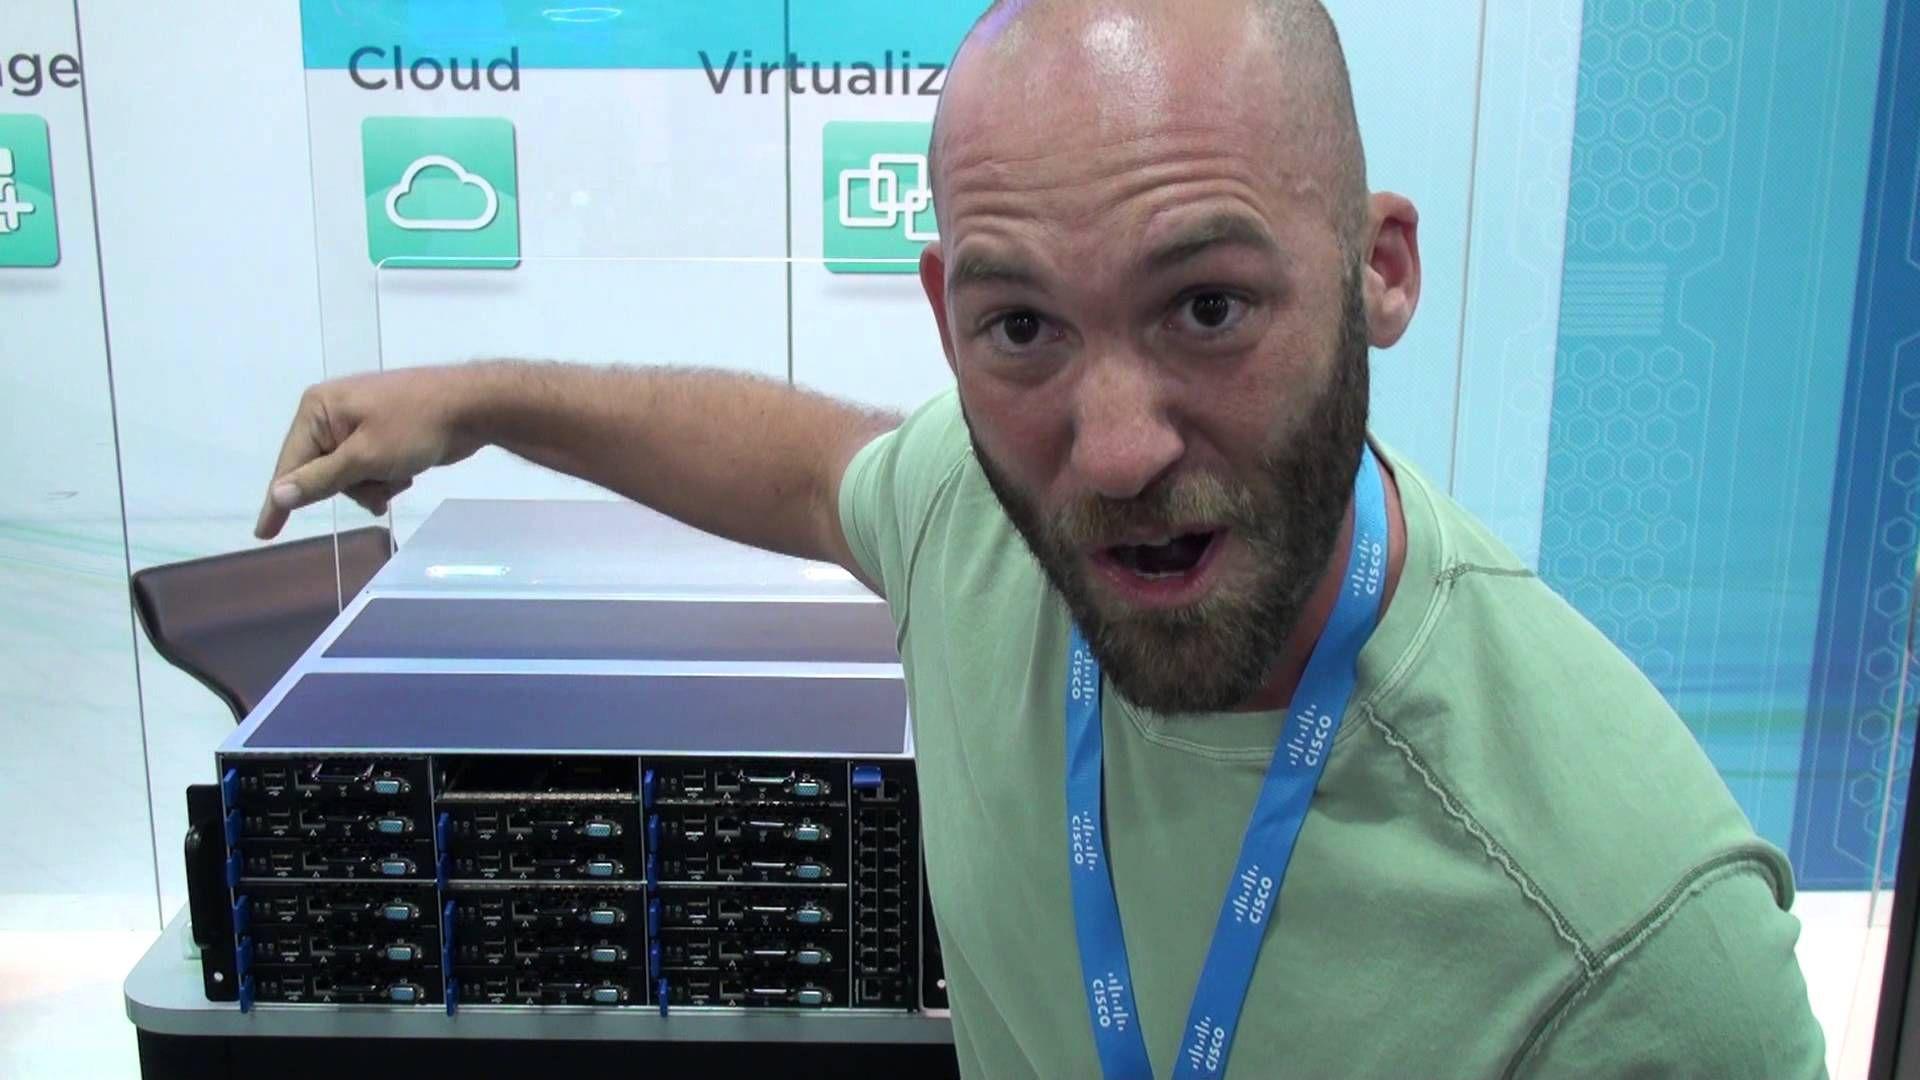 AMAX Micro Cloud Server - InterOp 2013 Booth Crawl